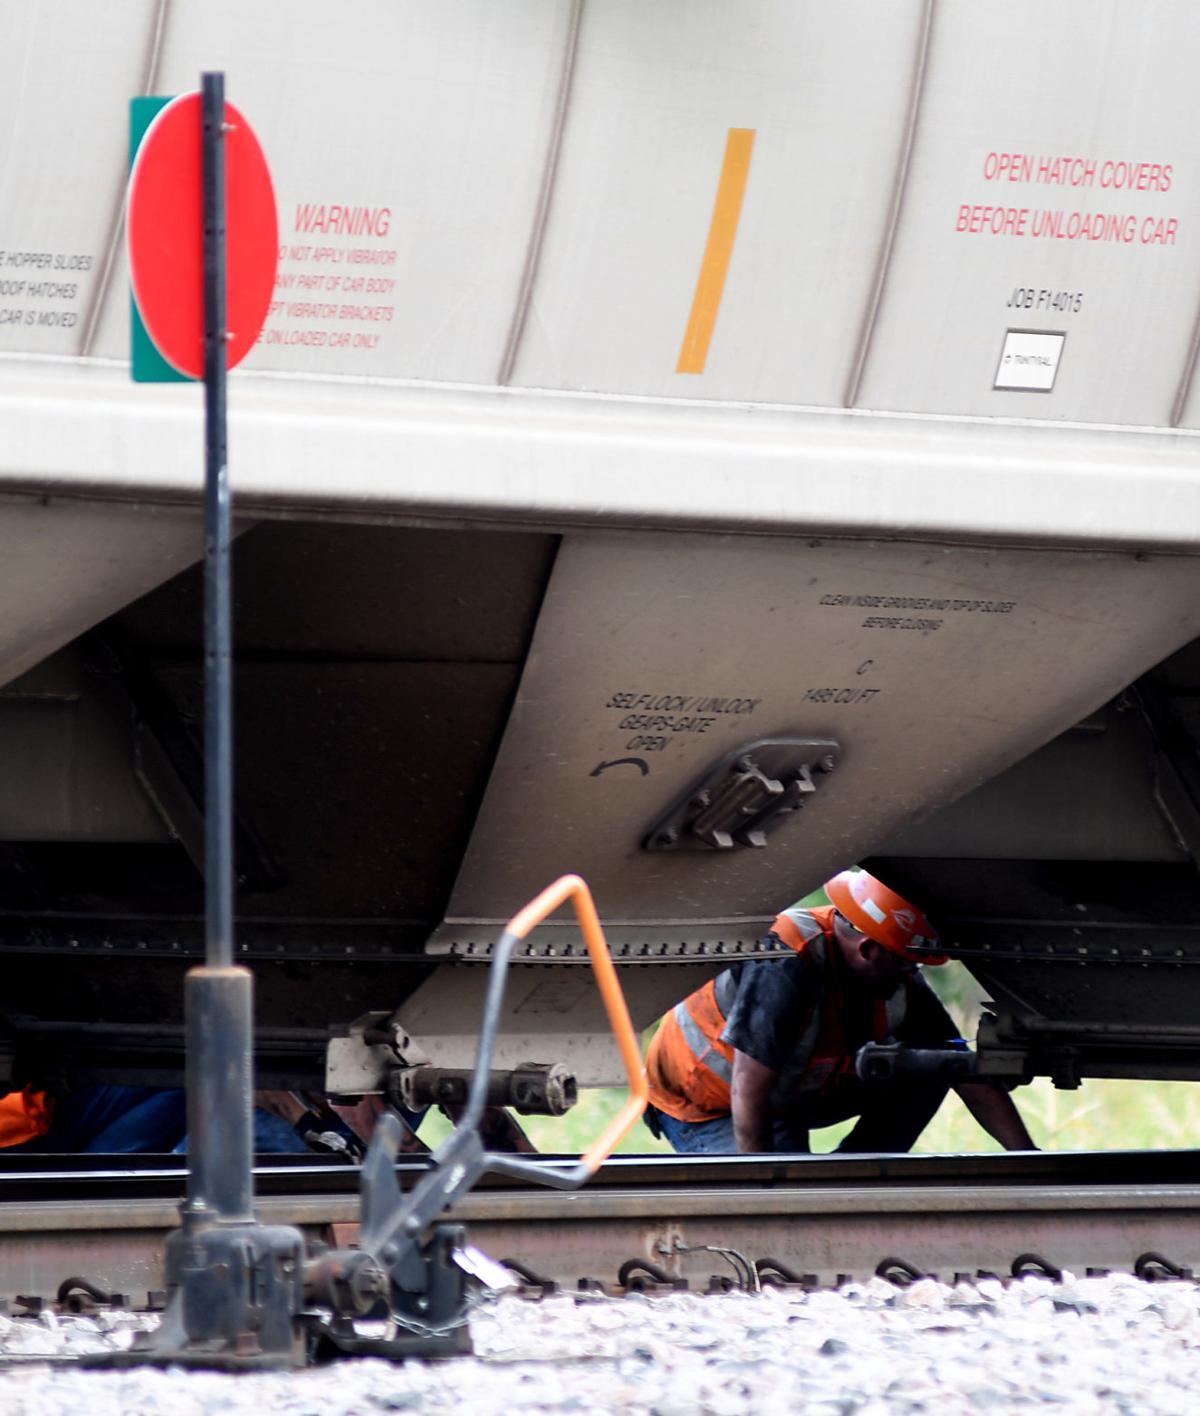 UPDATED: Train derailment blocks Enid streets | Community